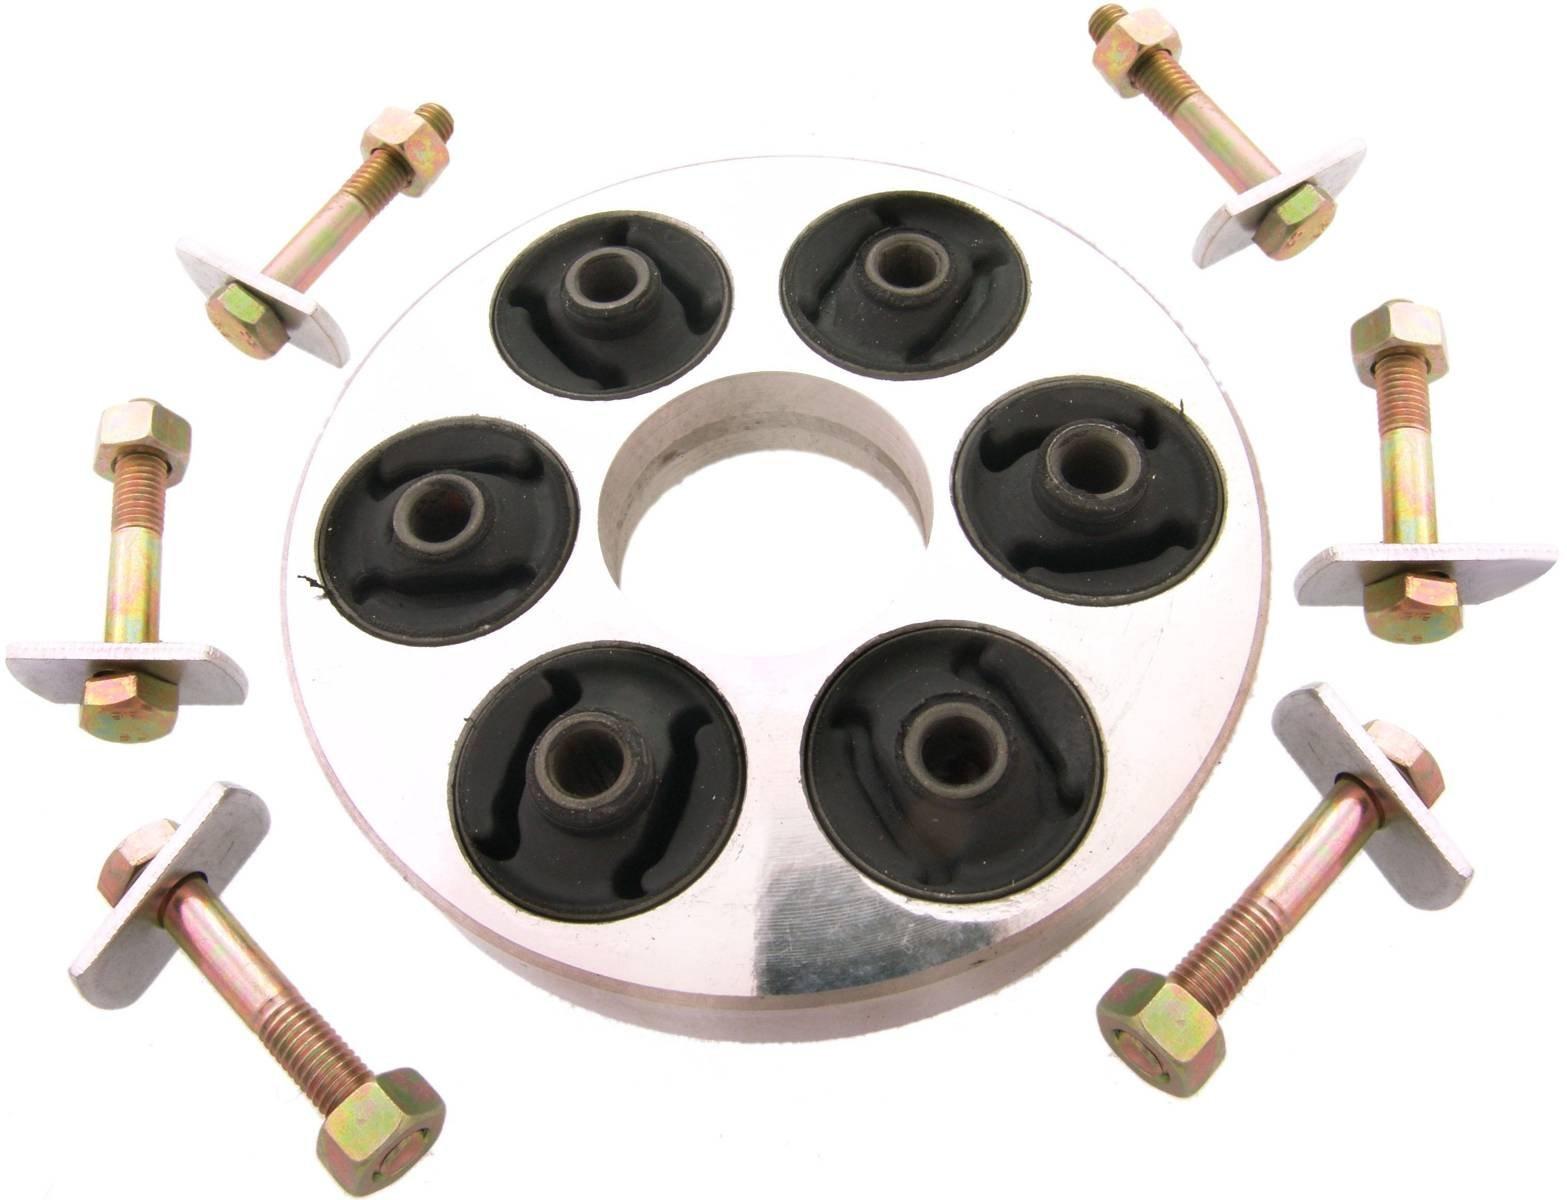 04374-28020 / 437428020 - Coupling Kit Equipment Drive Shaft For Toyota